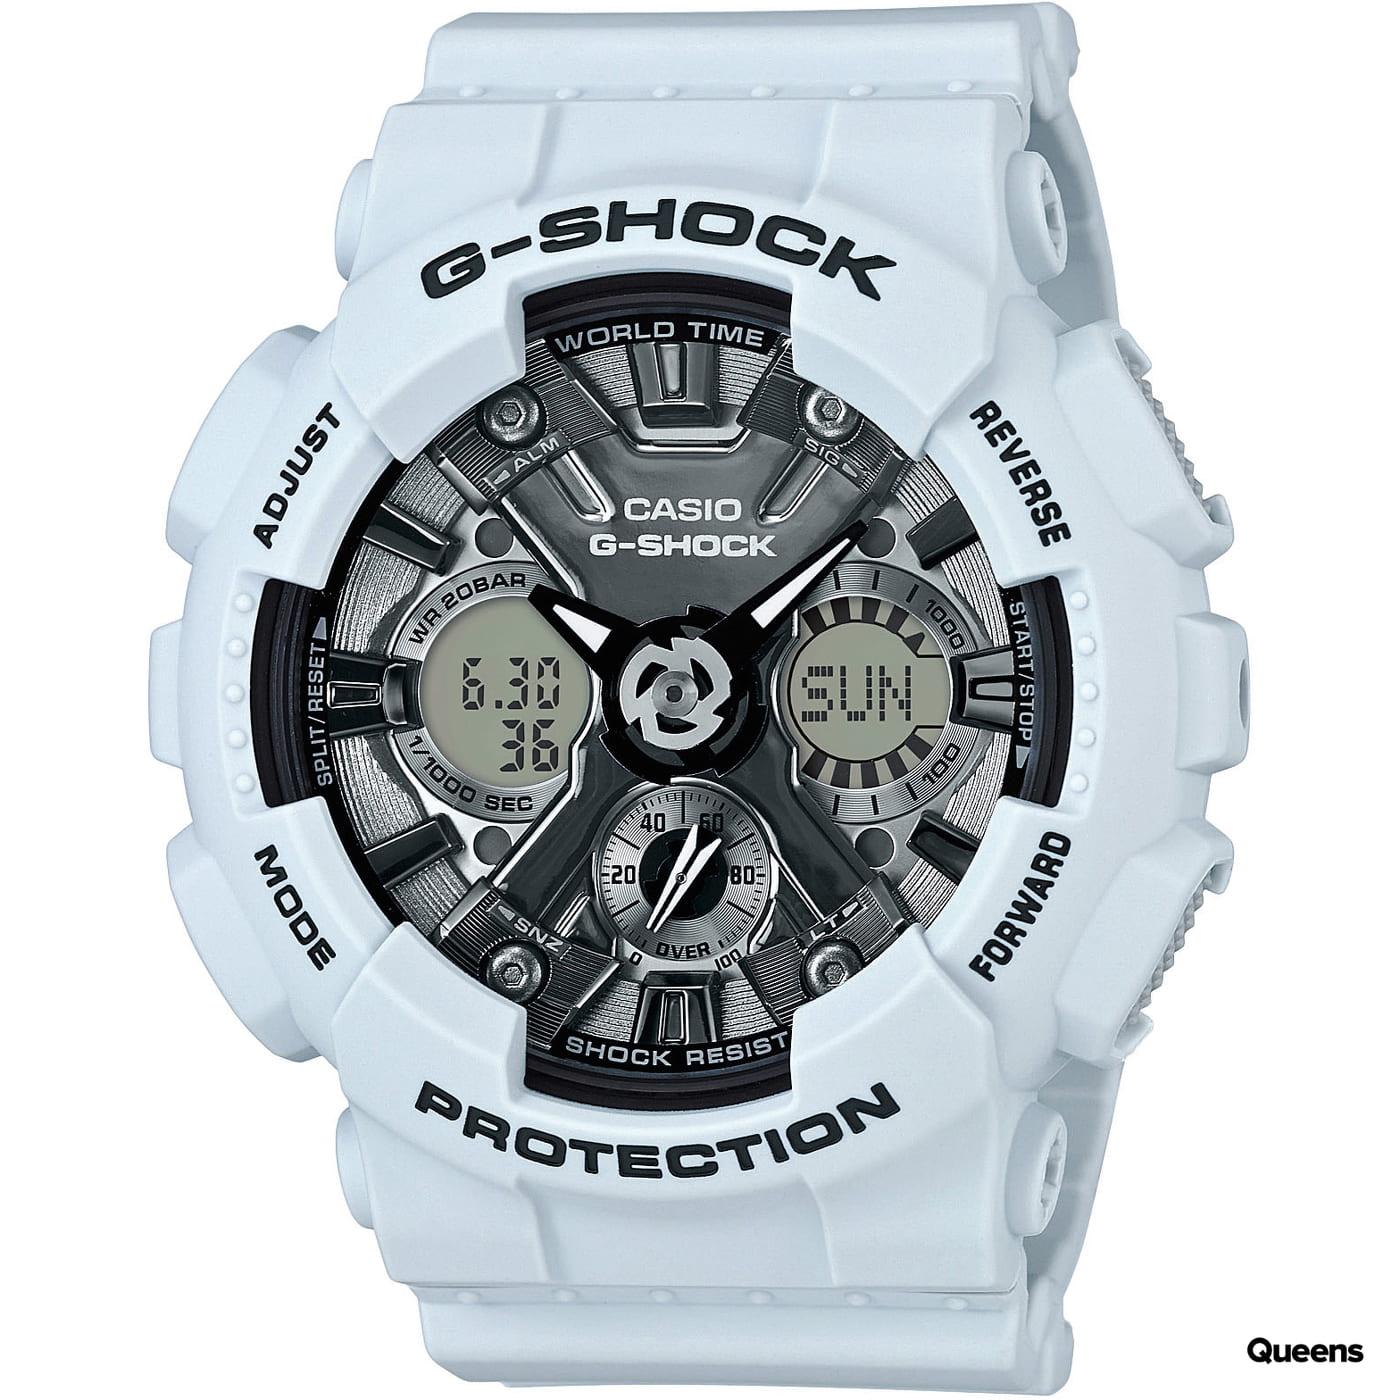 Casio G-Shock GMA S120MF-2AER svetlošedé